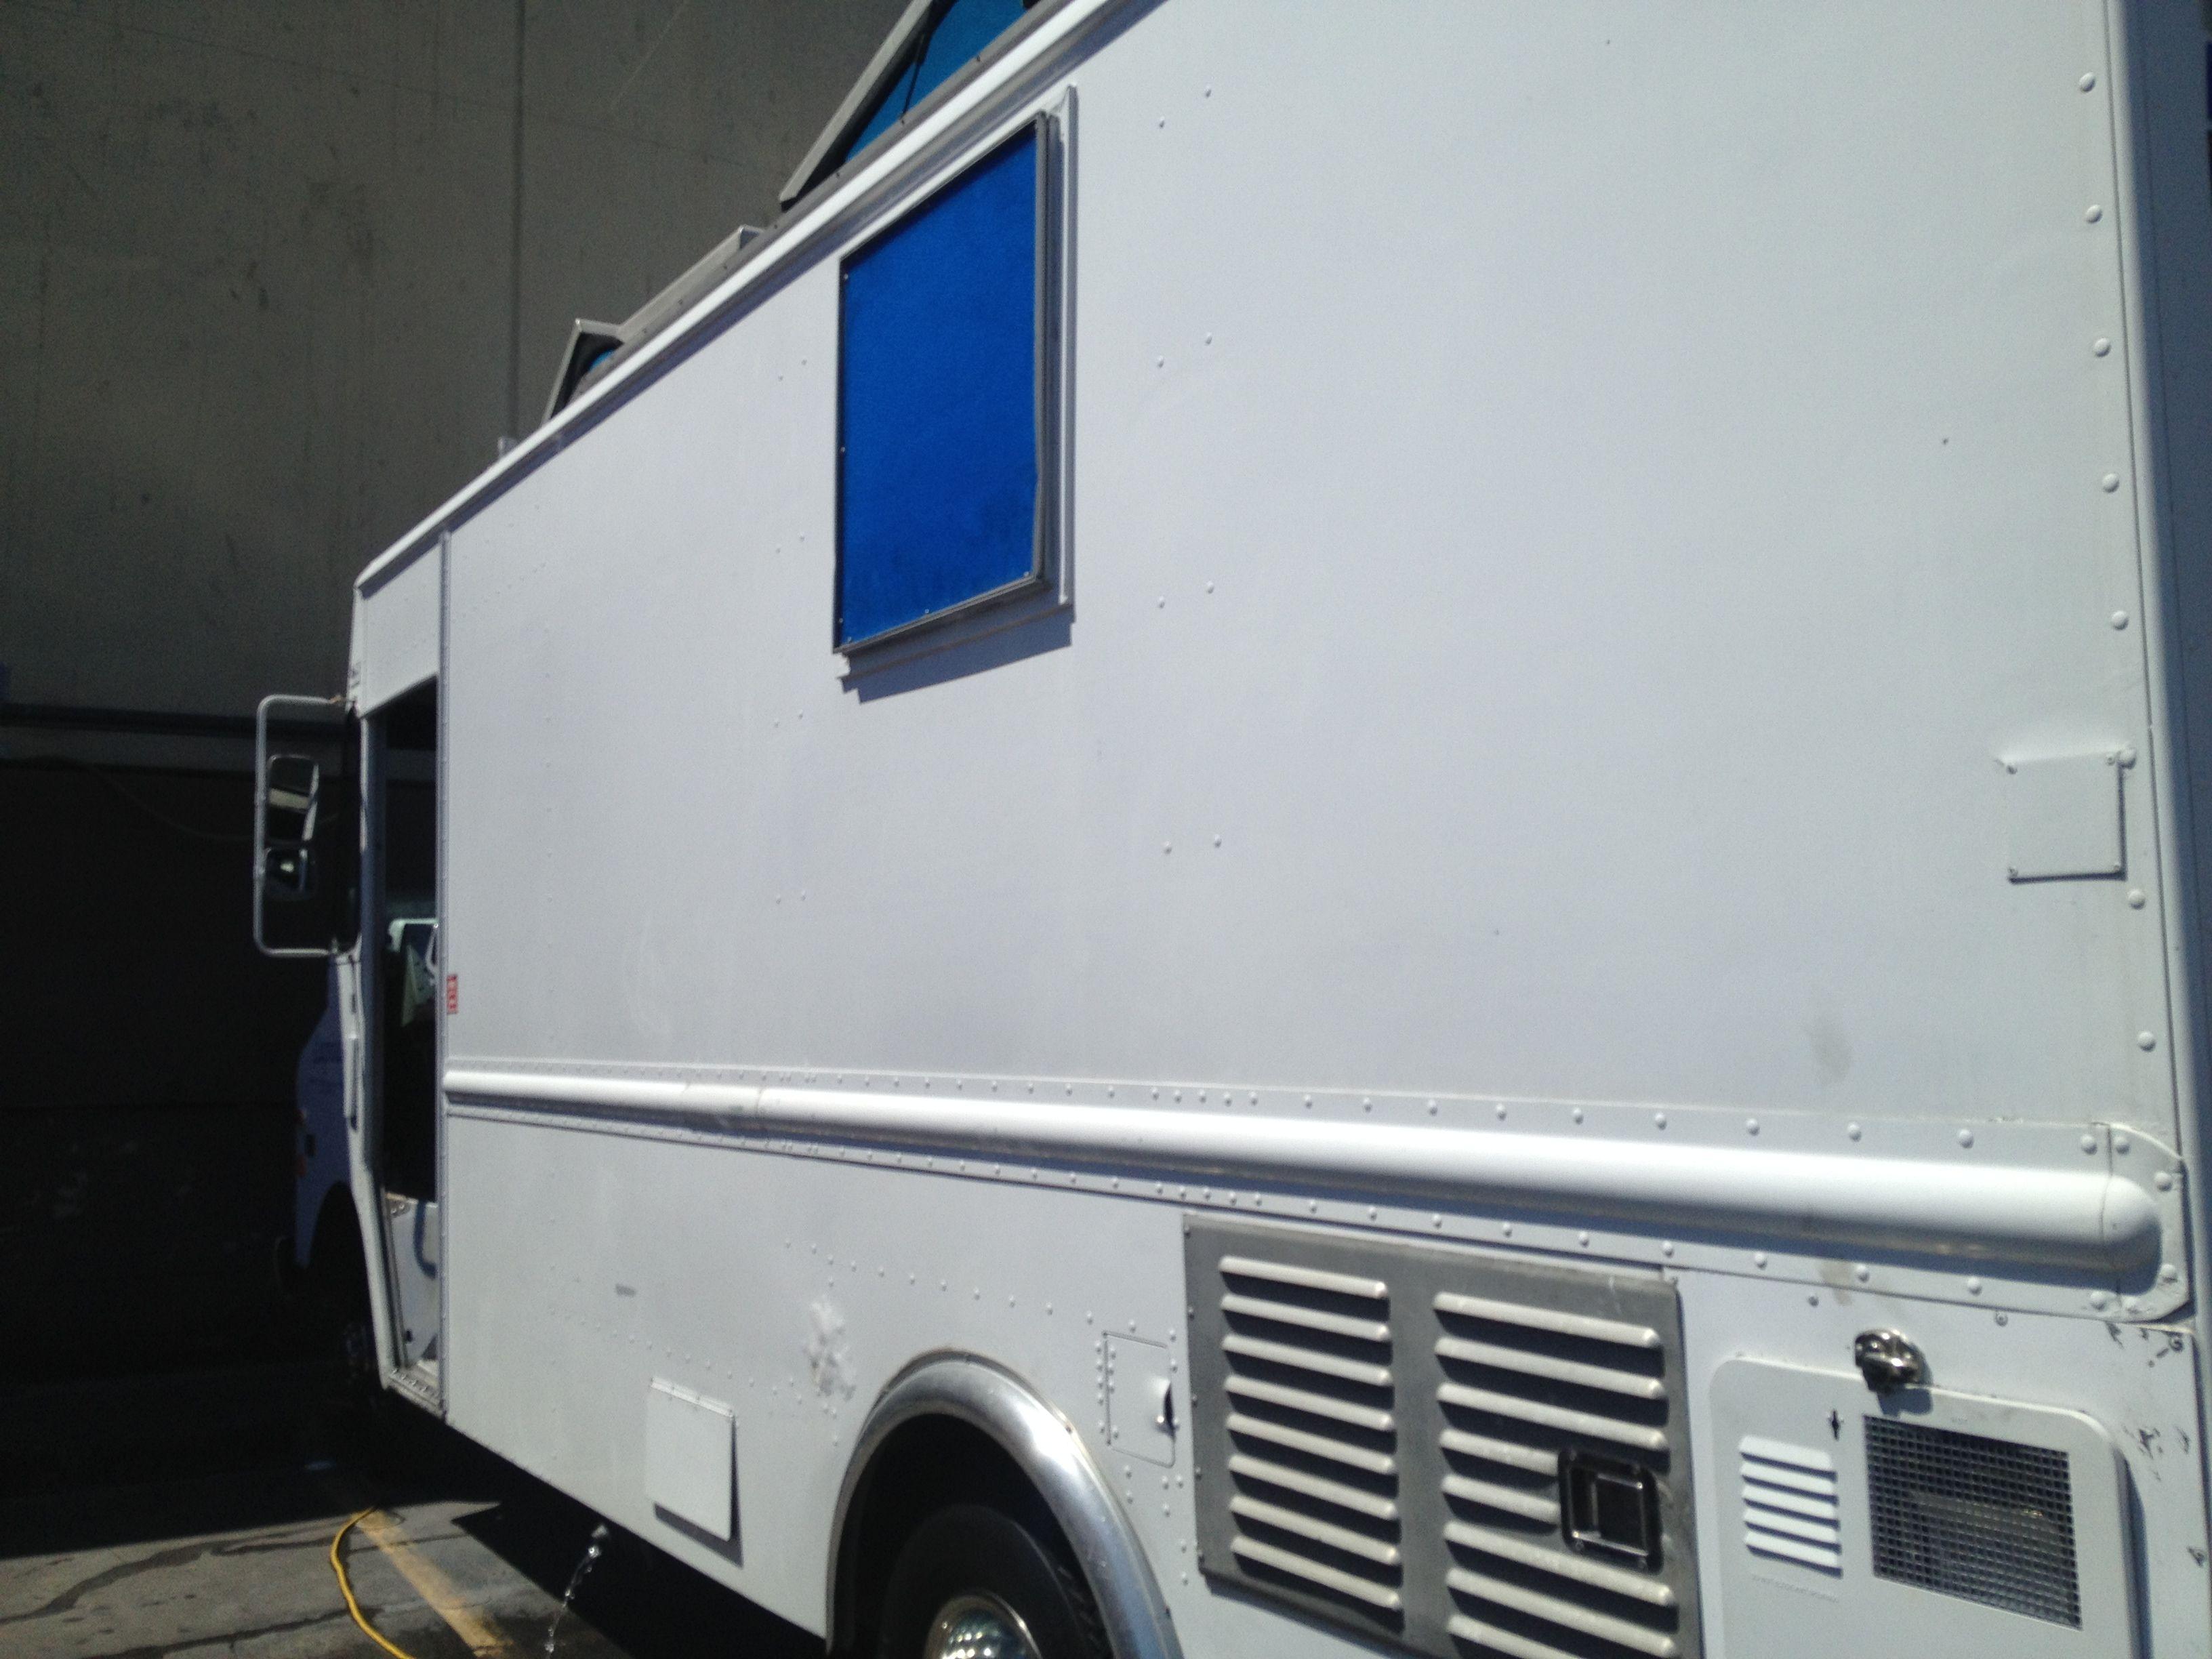 California style food truck food truck design